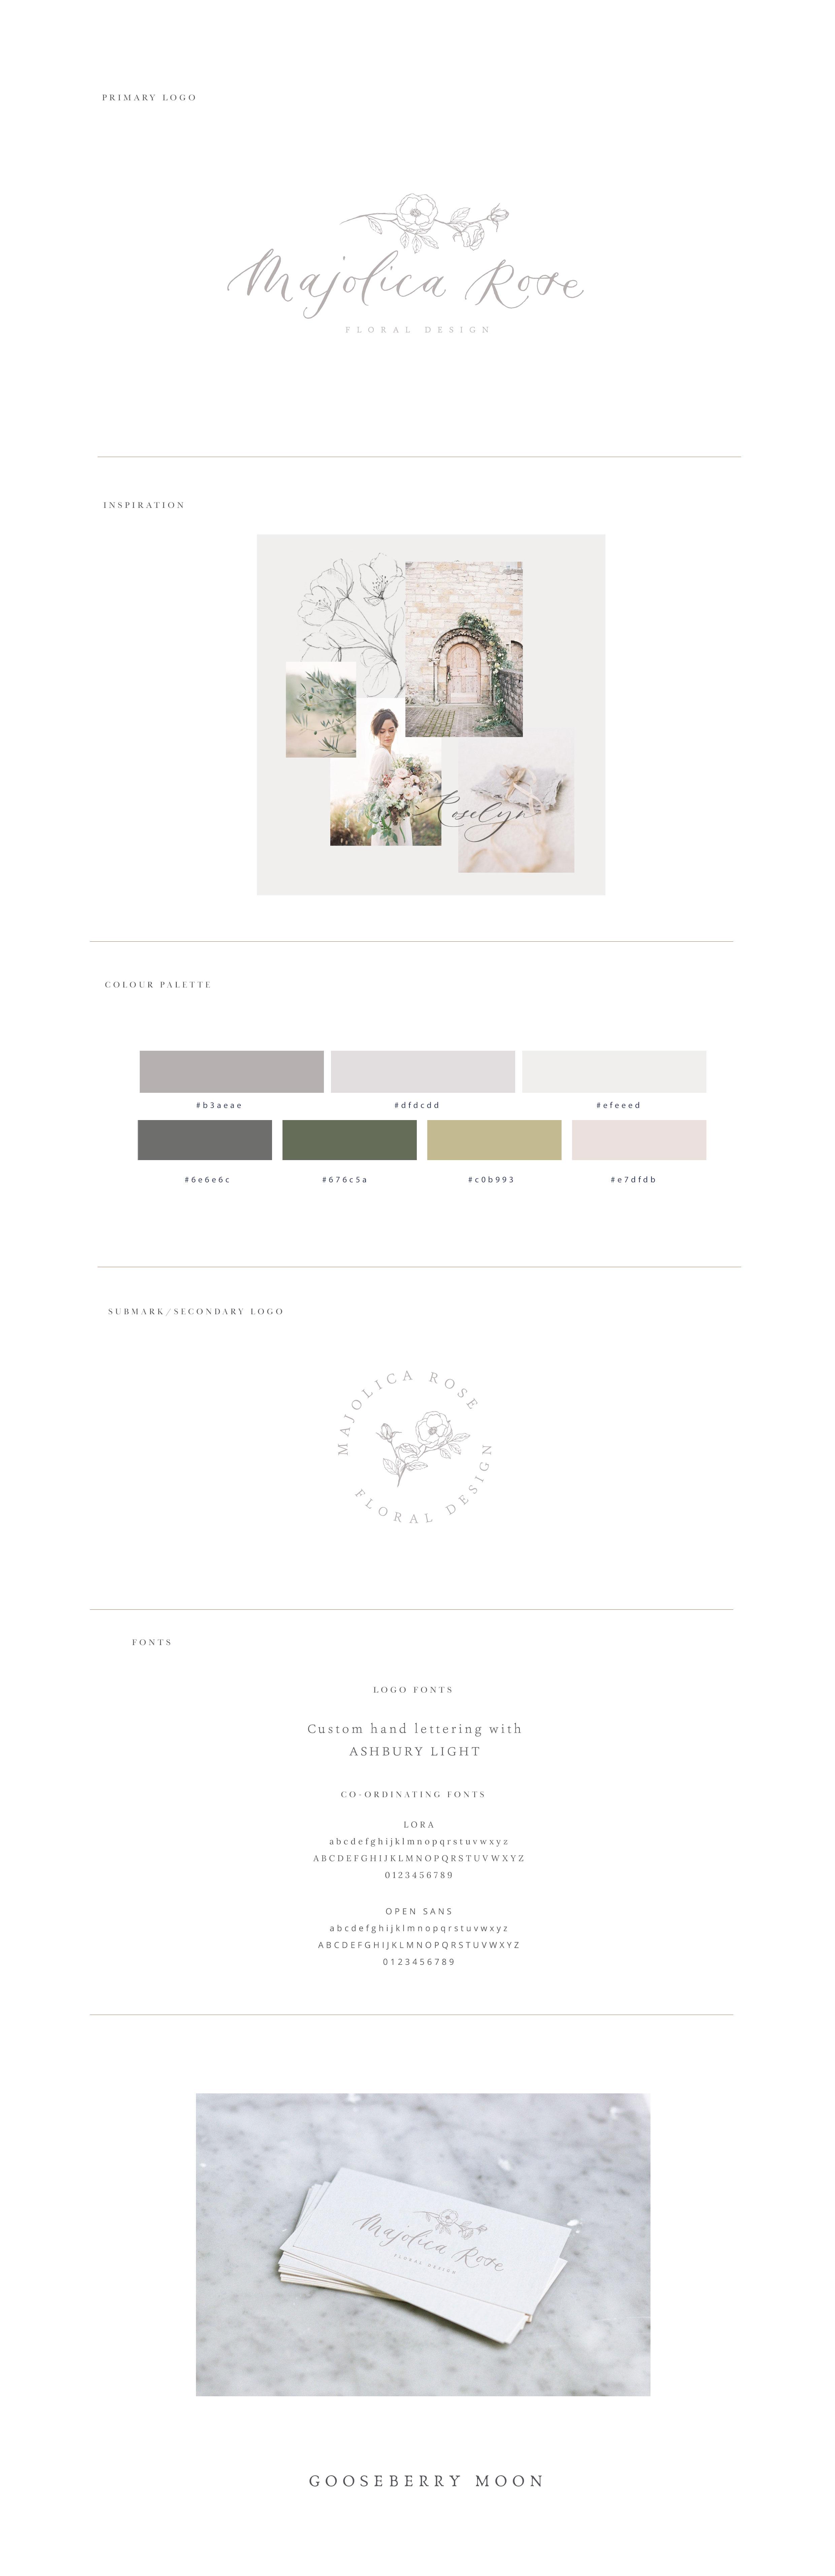 brand-board-v1-WEB.jpg